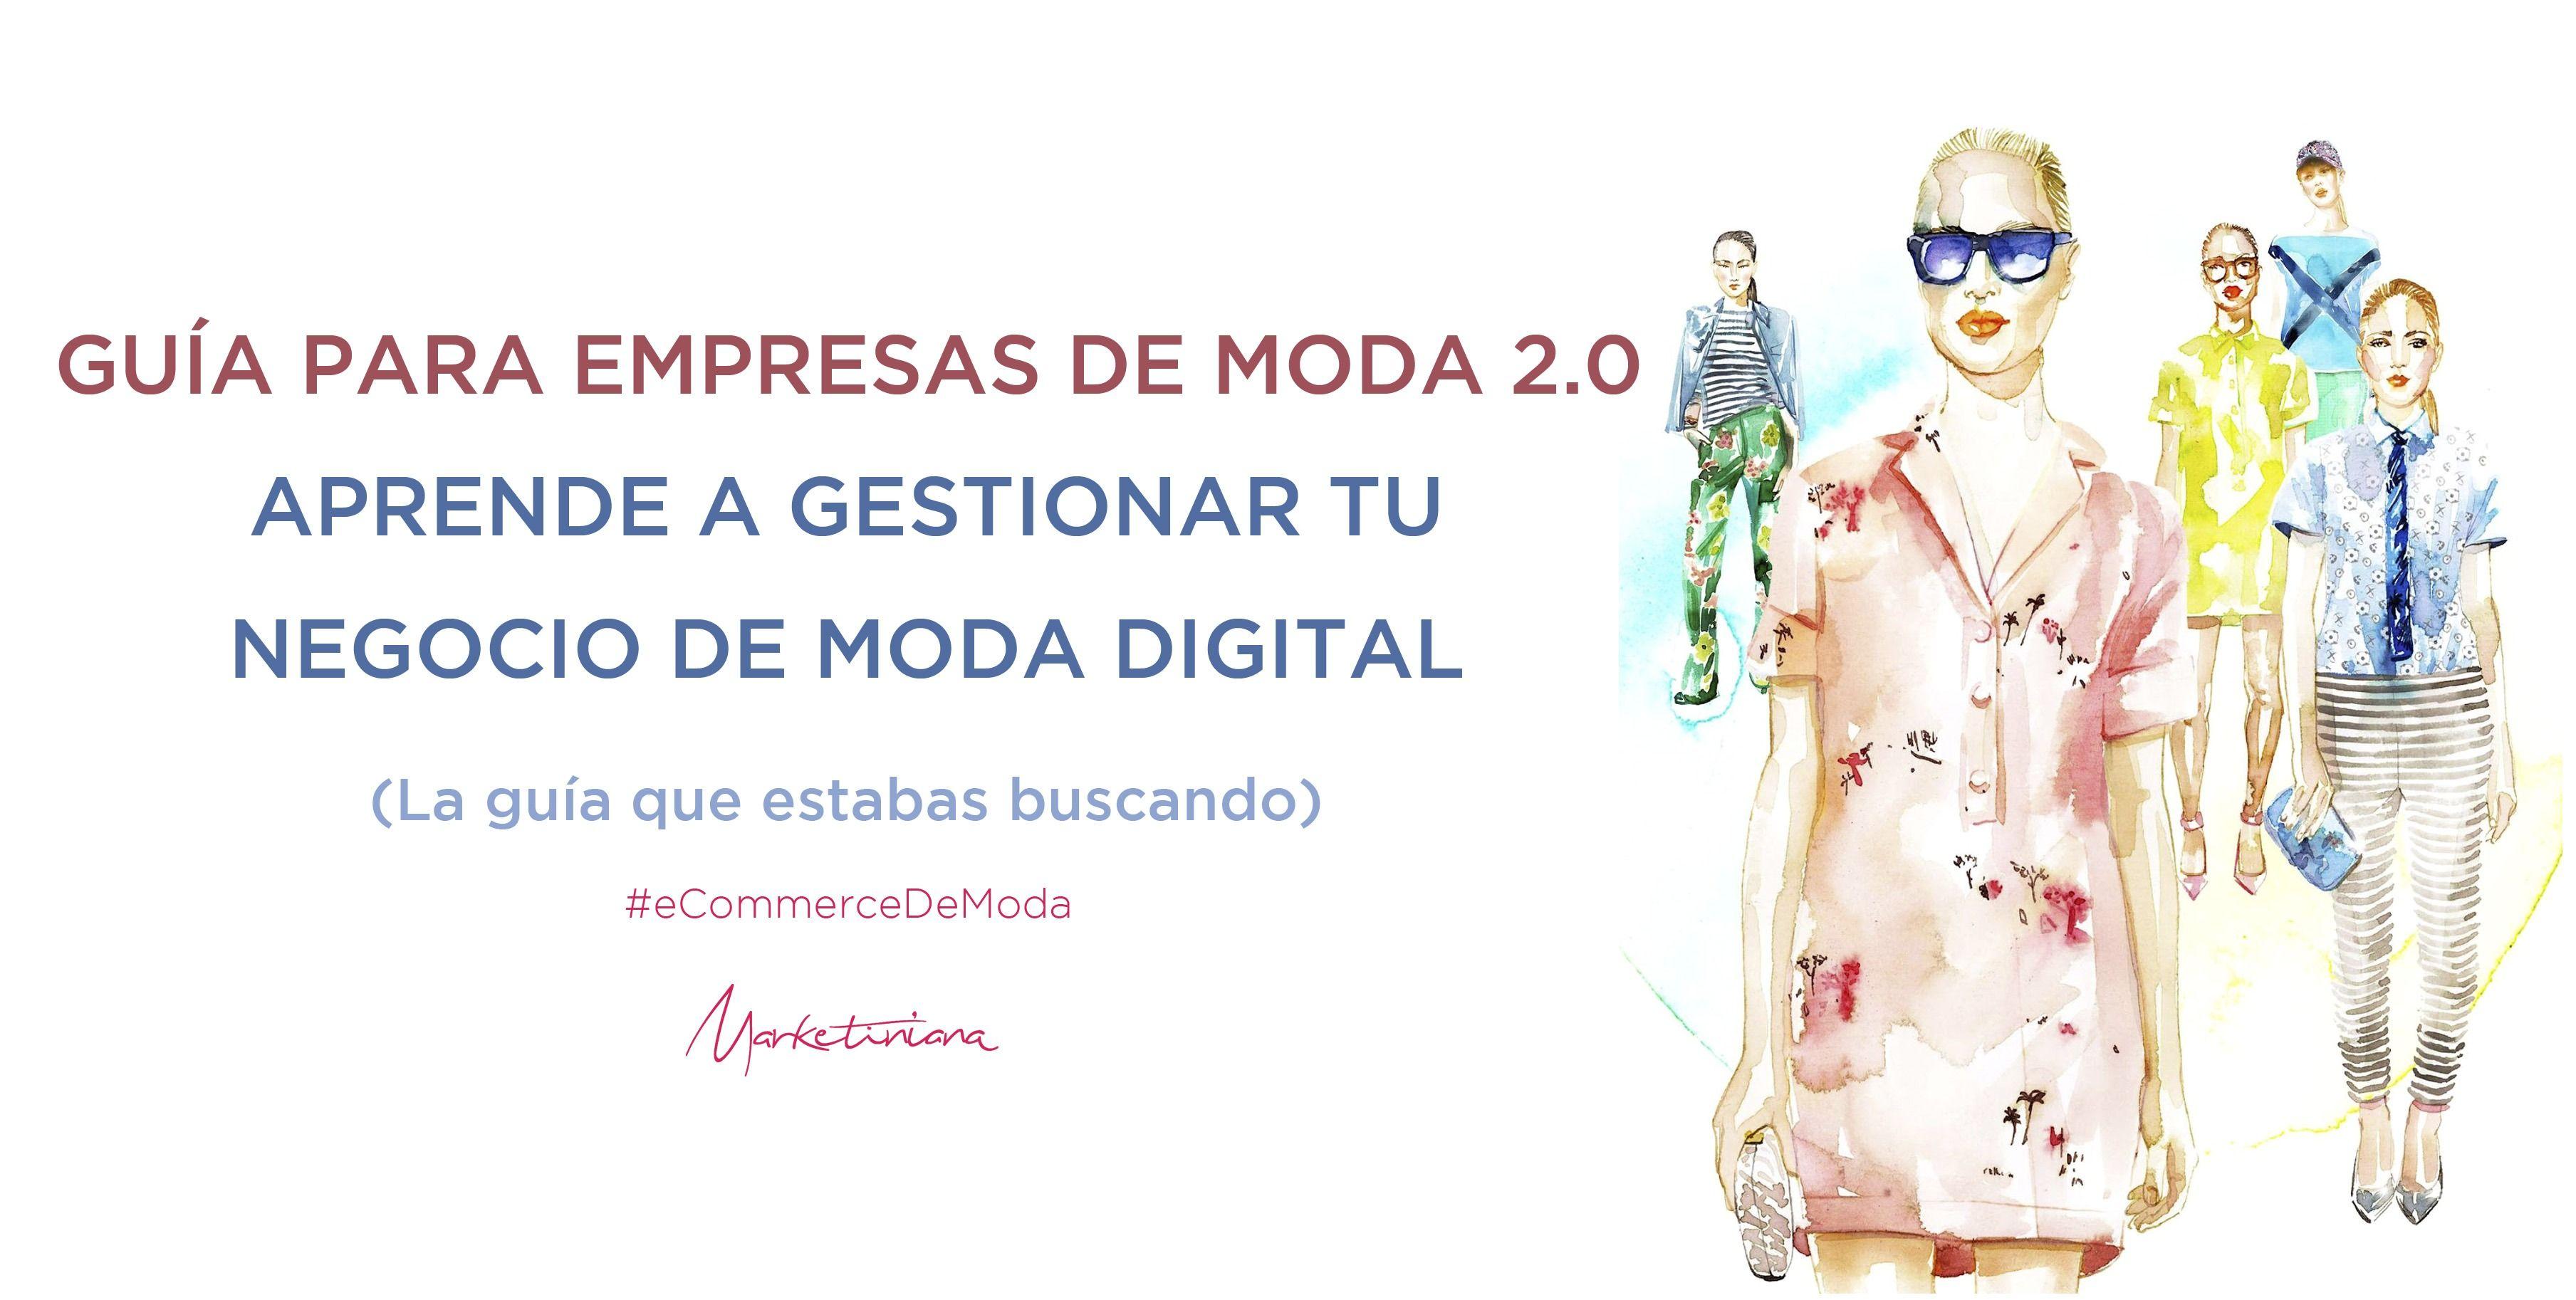 empresas-de-moda-online.jpg